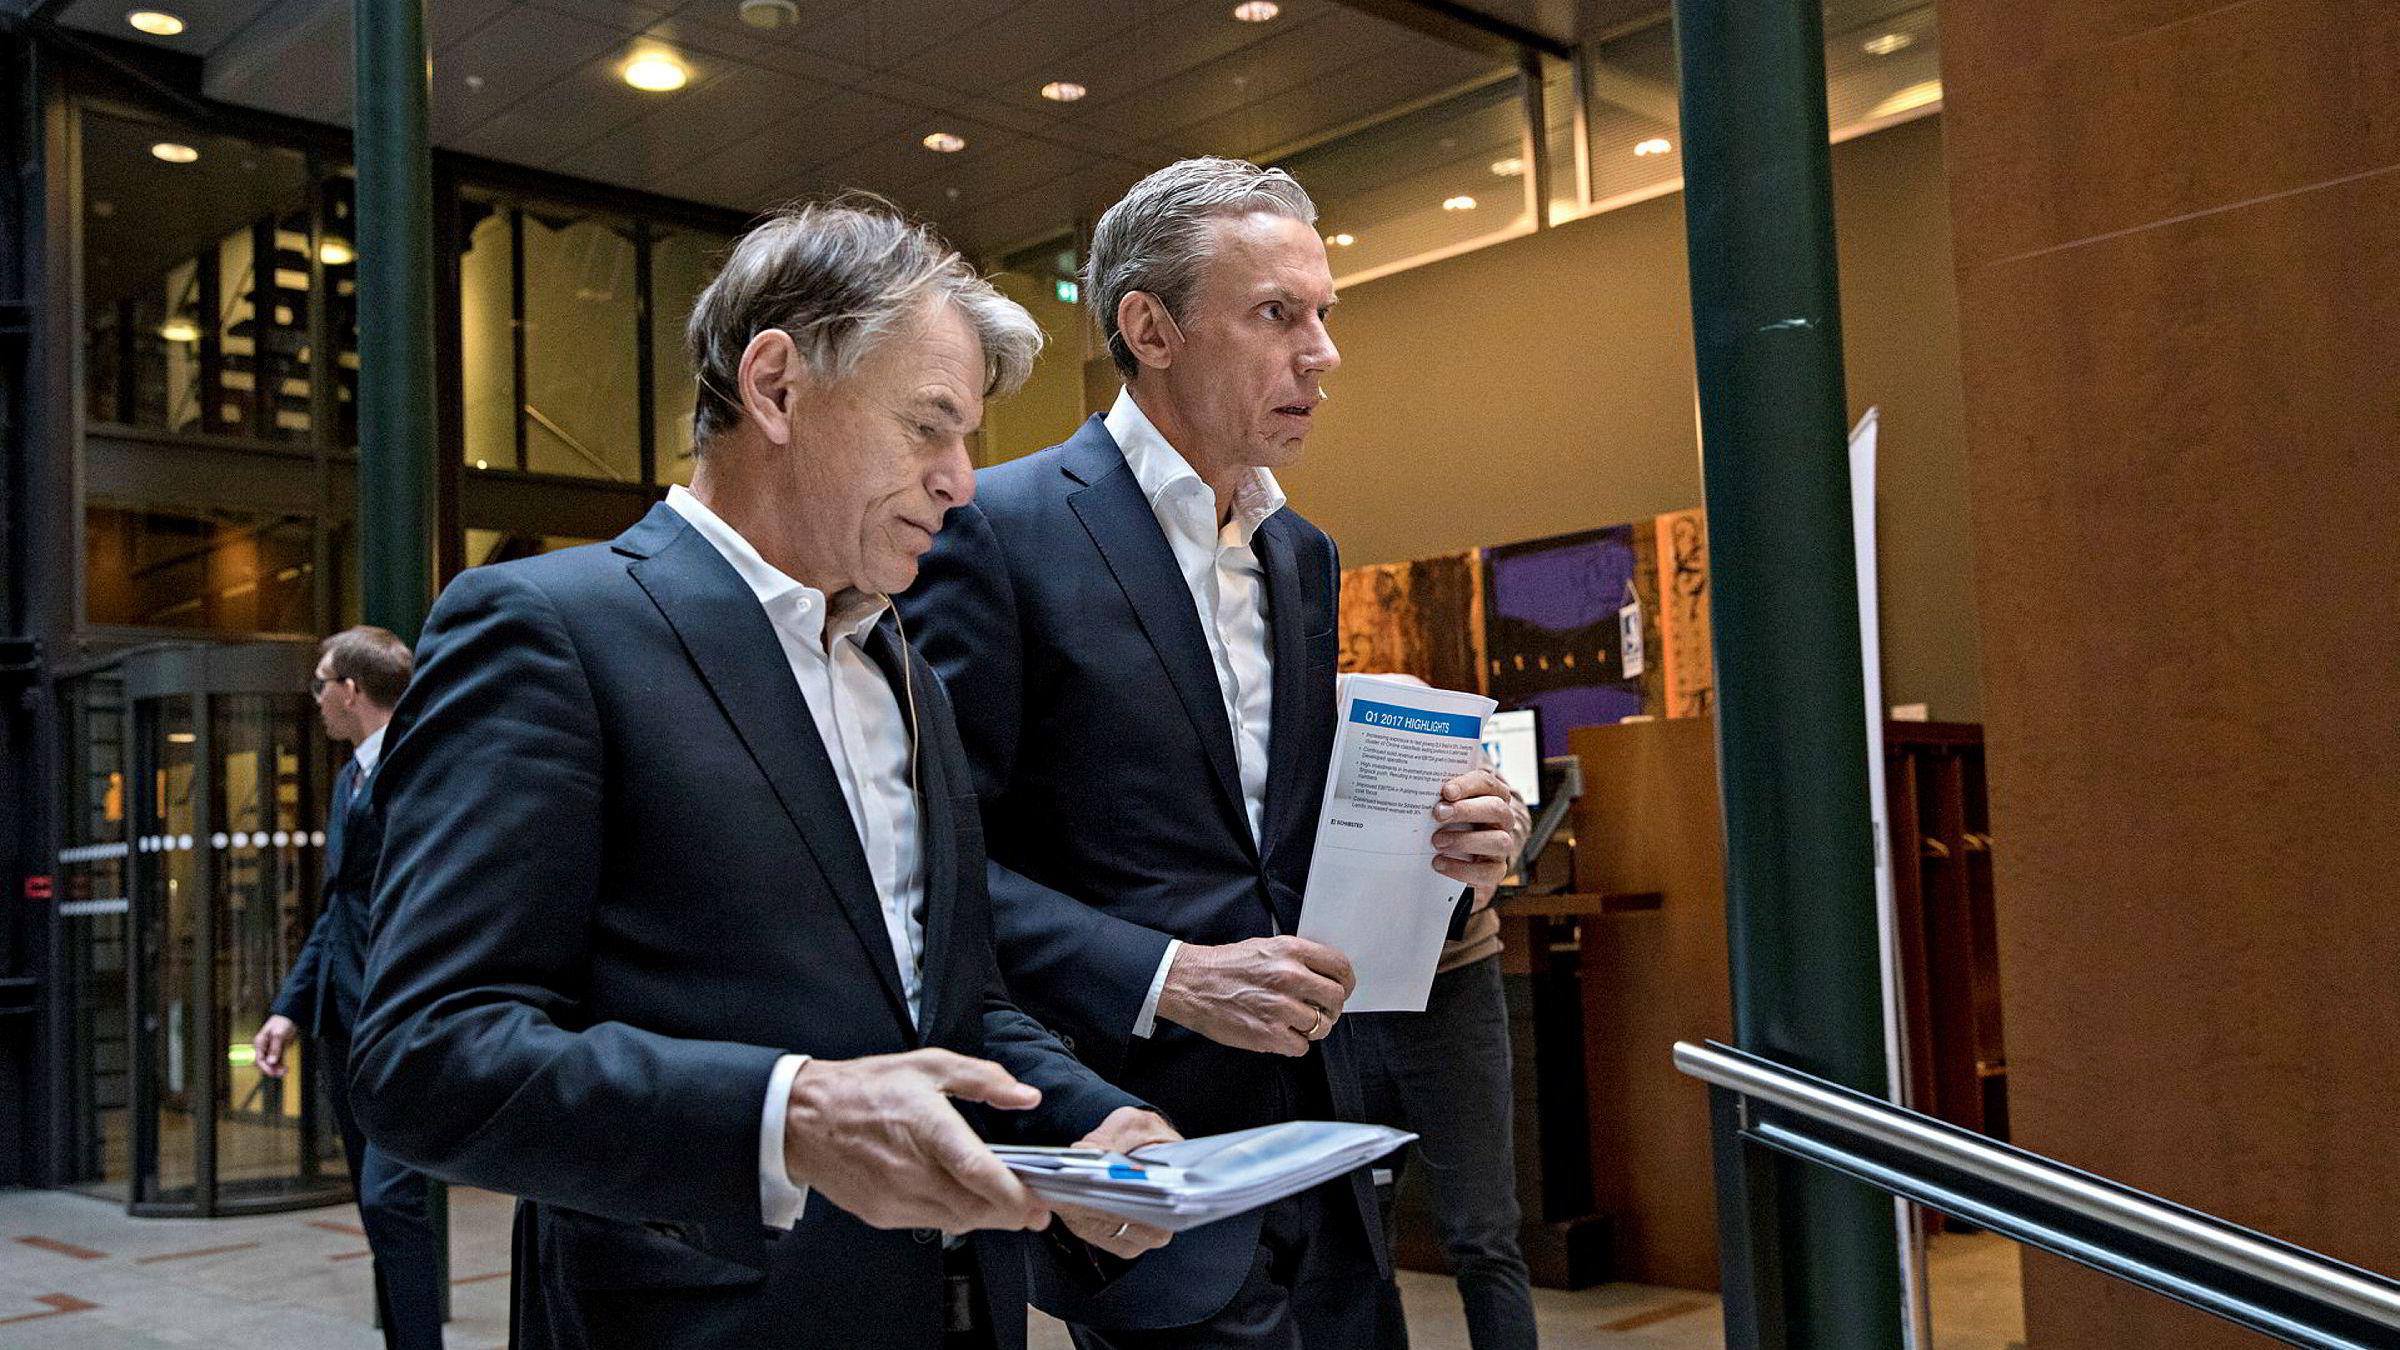 – Både omsetning og resultat fortsatte å vokse bra i Schibsteds første kvartal 2017, ifølge selskapets toppsjef Rolv Erik Ryssdal. Her er han sammen med finansdirektør Trond Berger (til venstre) fredag morgen.